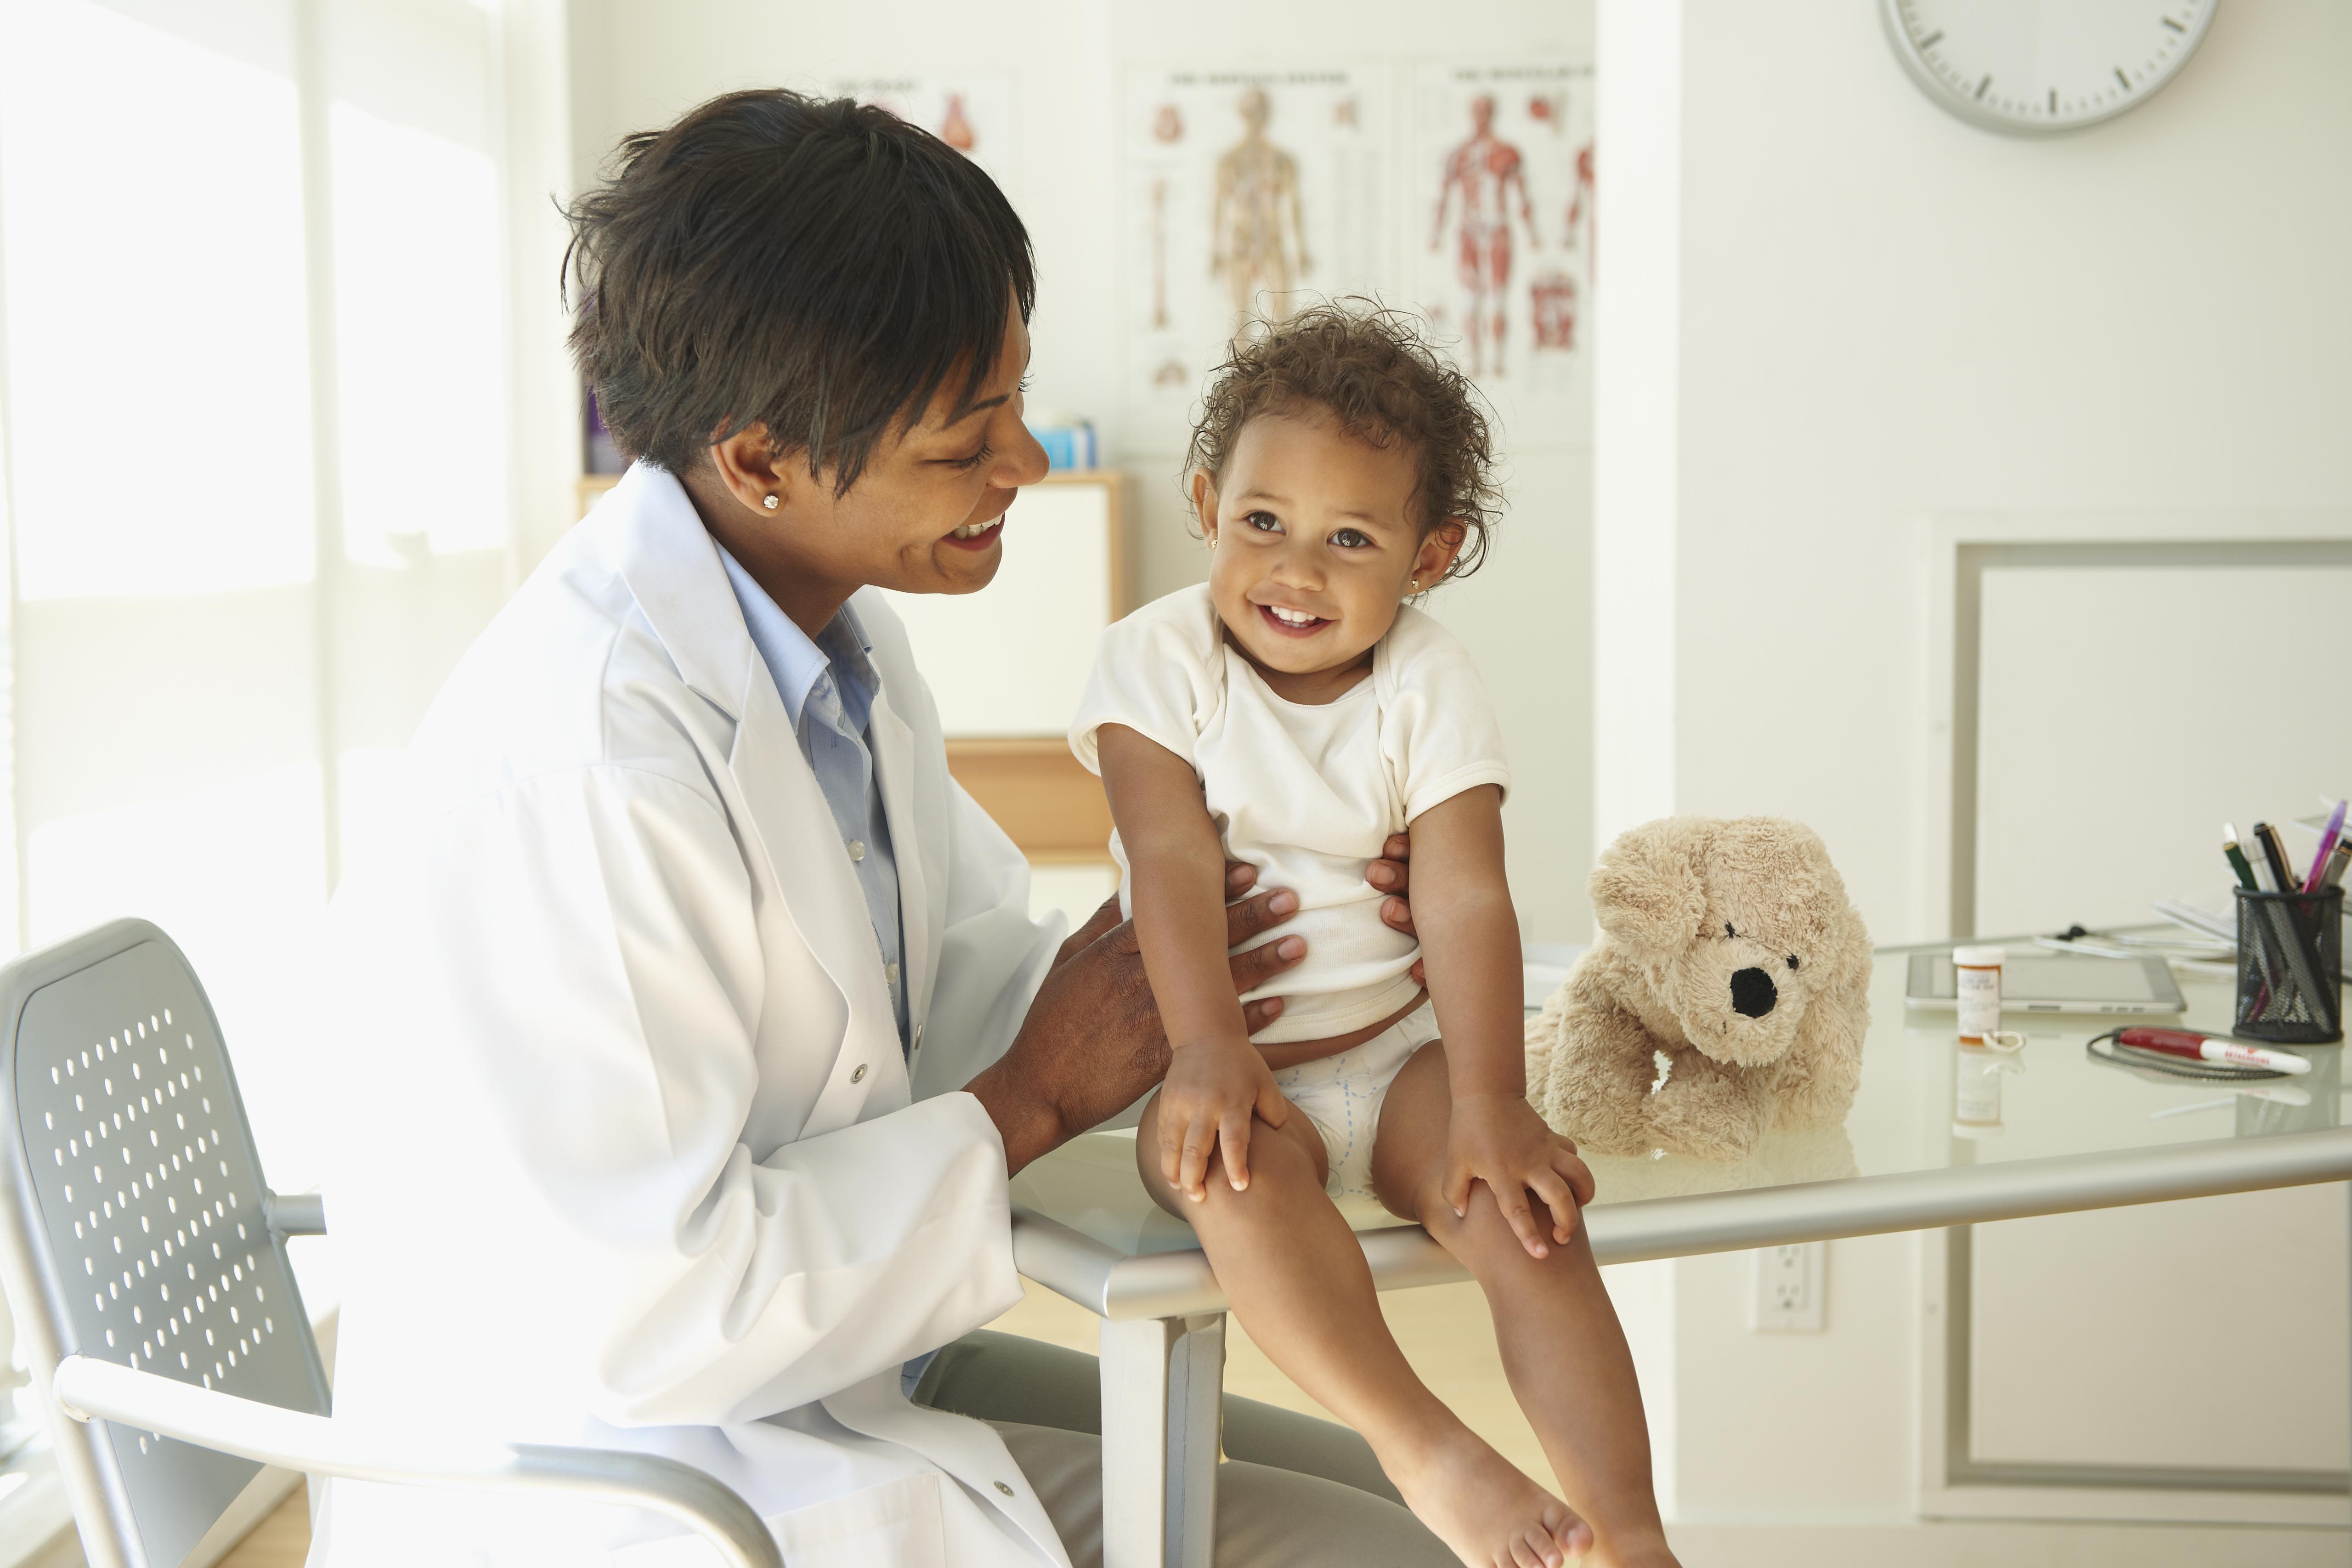 Doctor examining baby in doctor's office